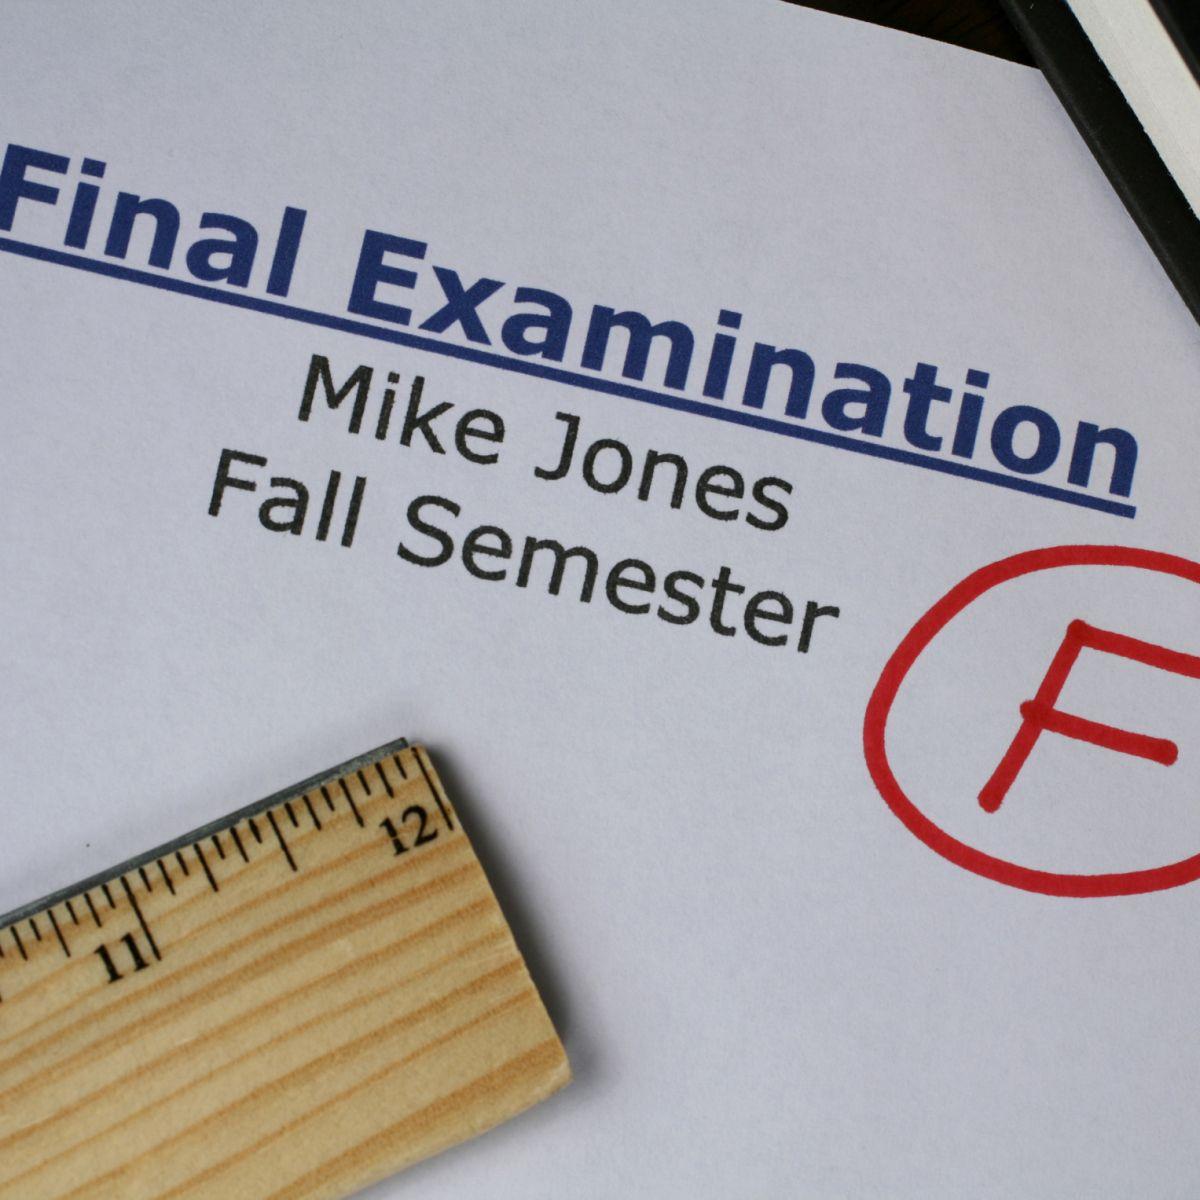 Finals week prep the best way to handle an essay final